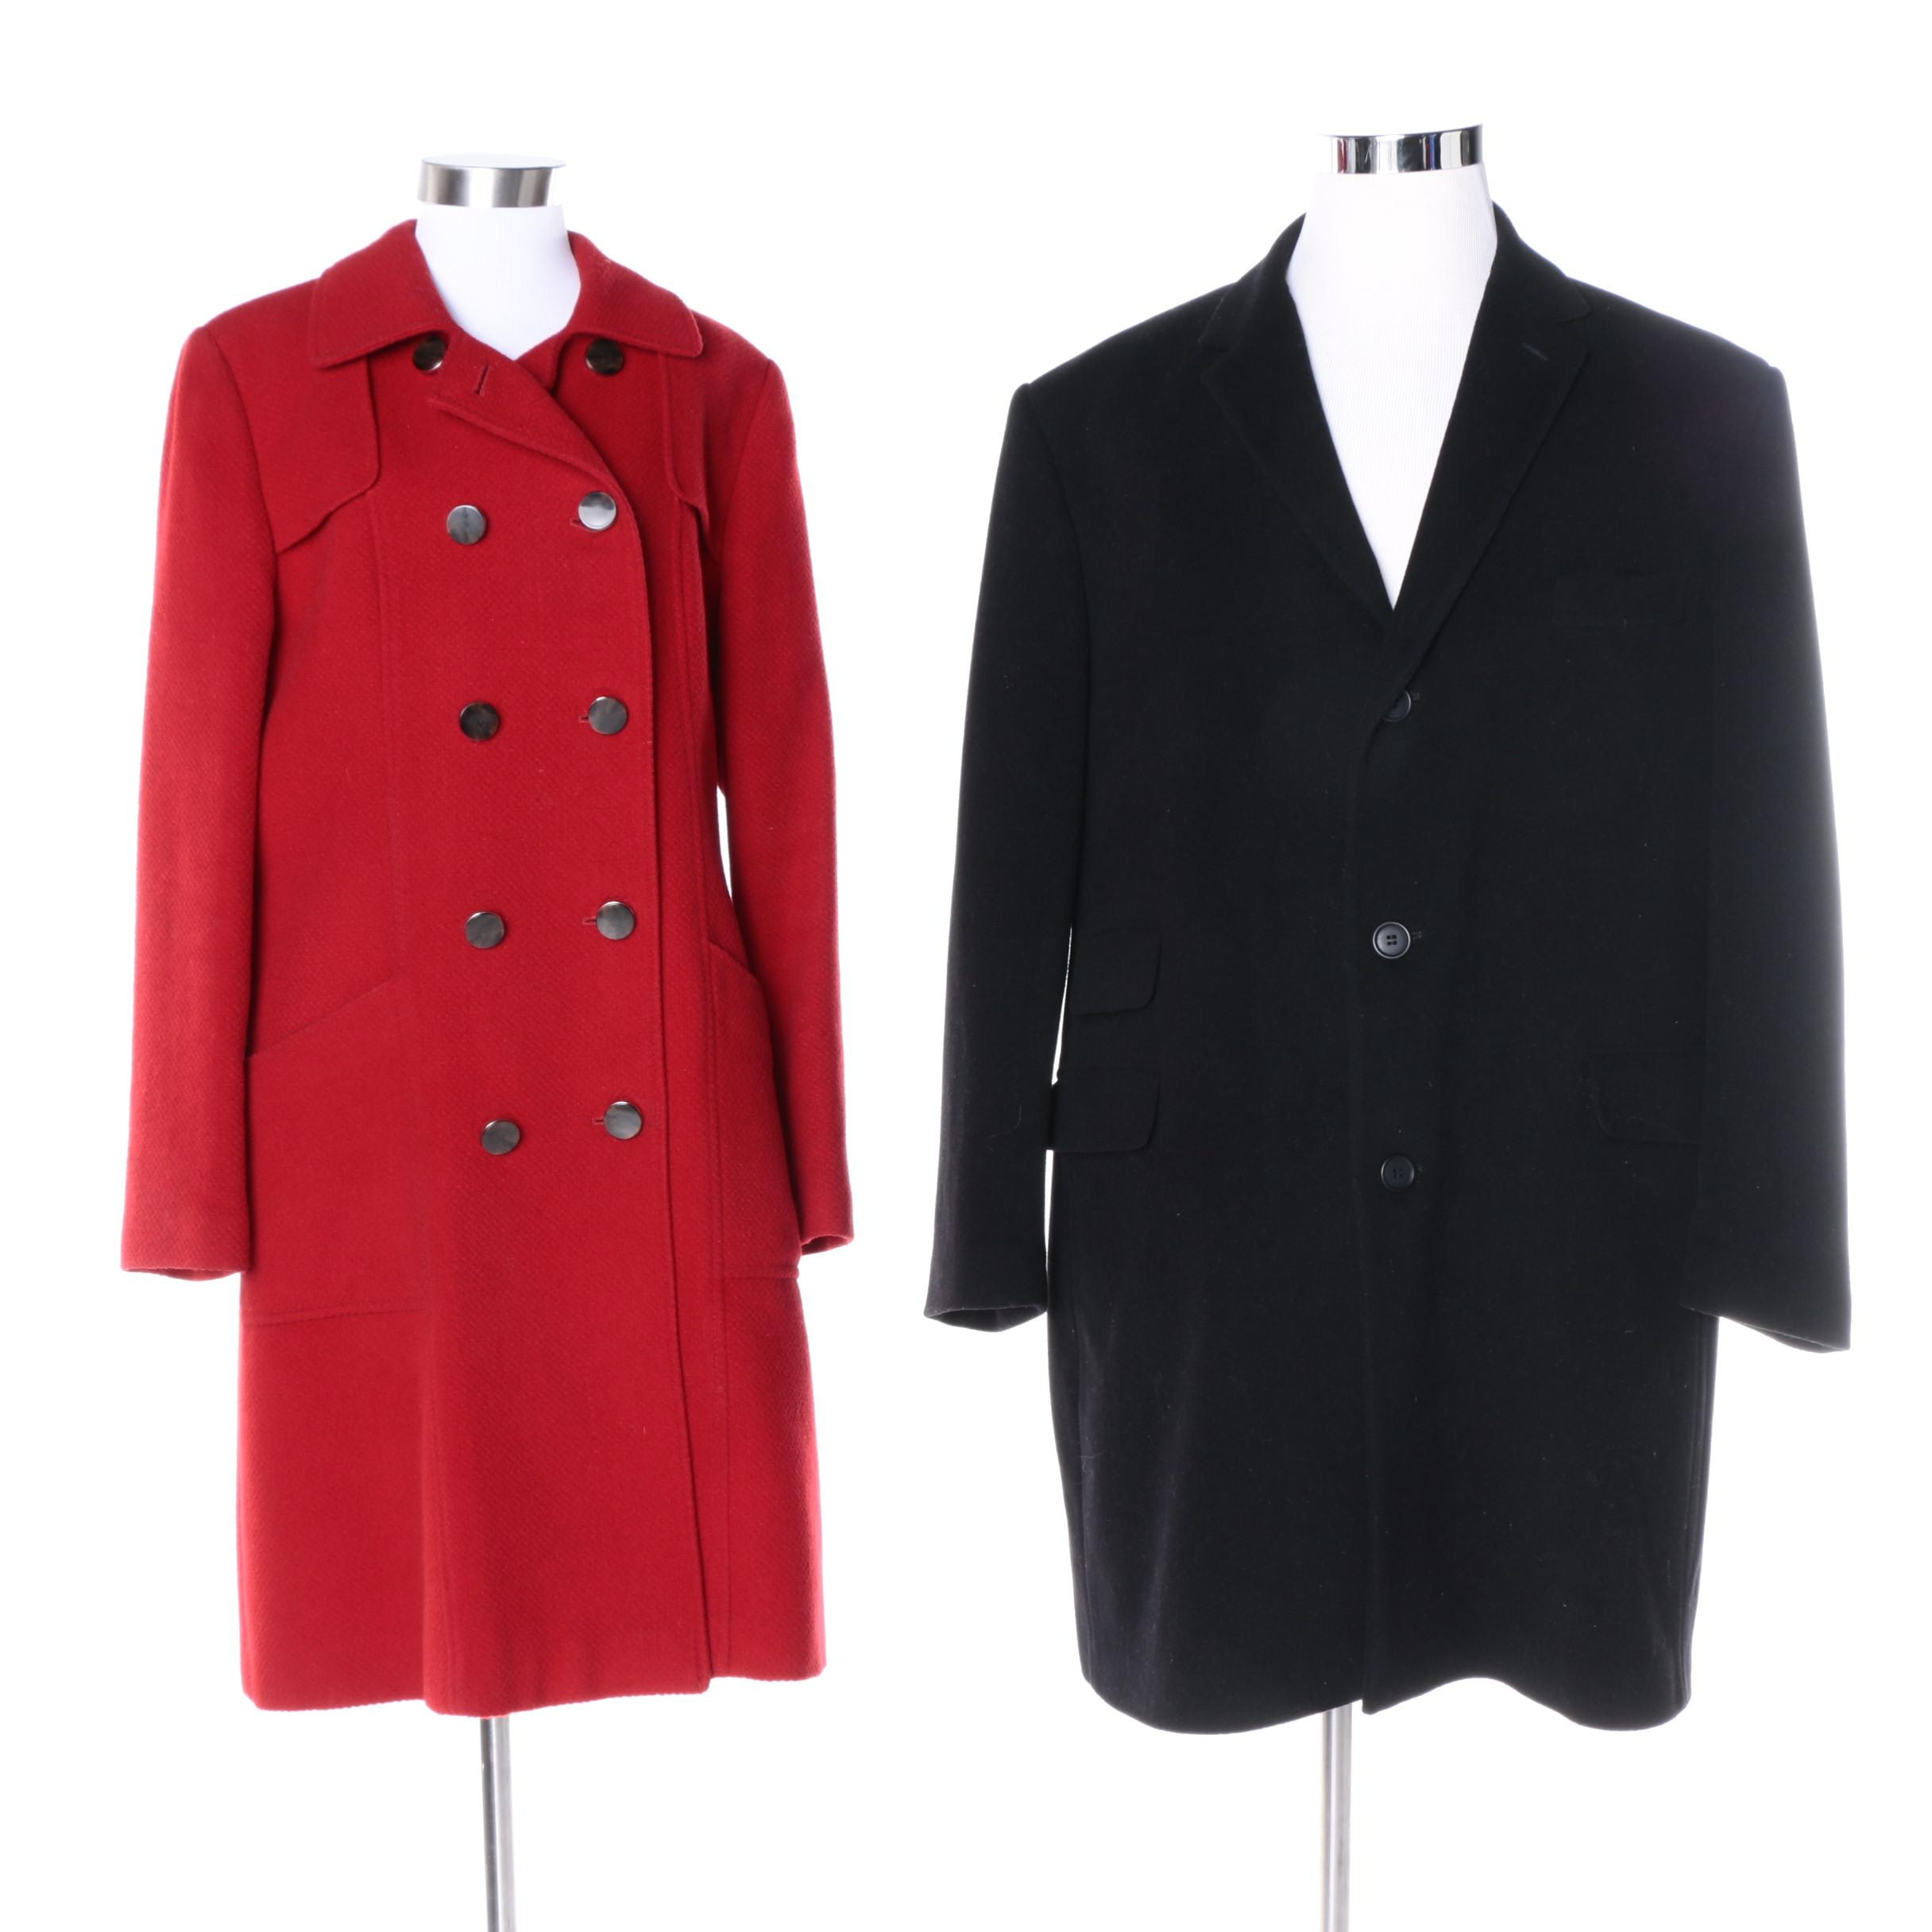 Women's & Men's Wool Blend Outerwear